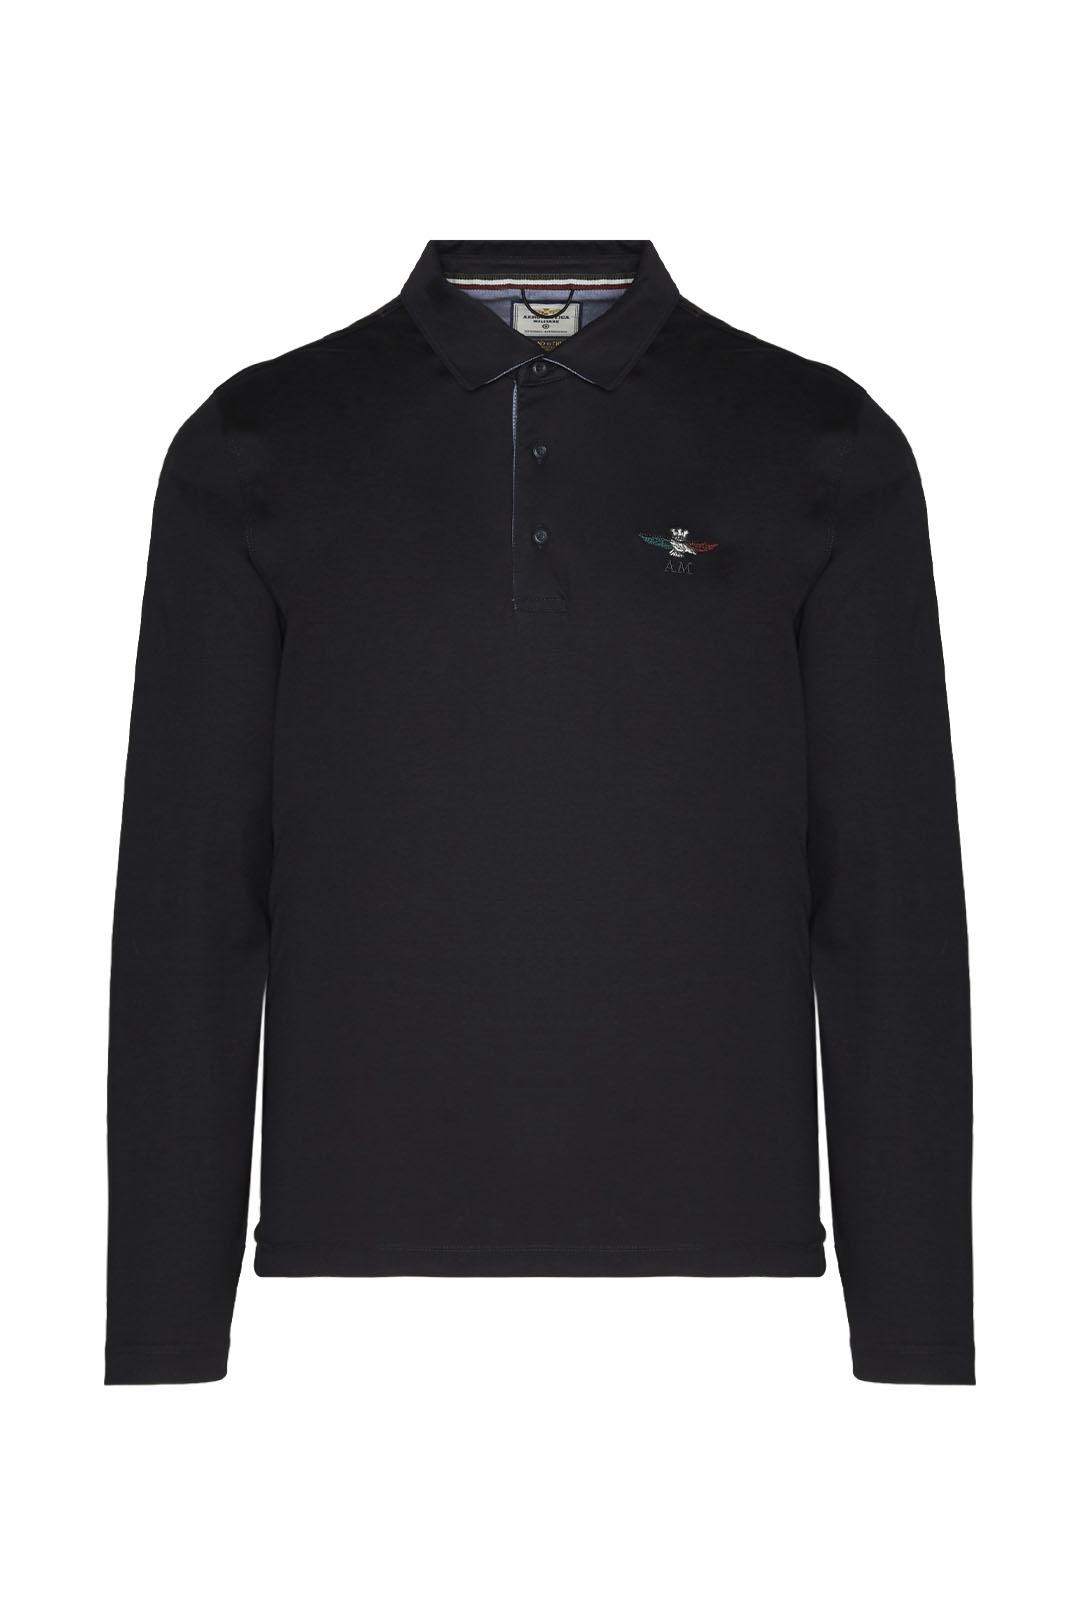 Poloshirt mit trikolorem Adler           1